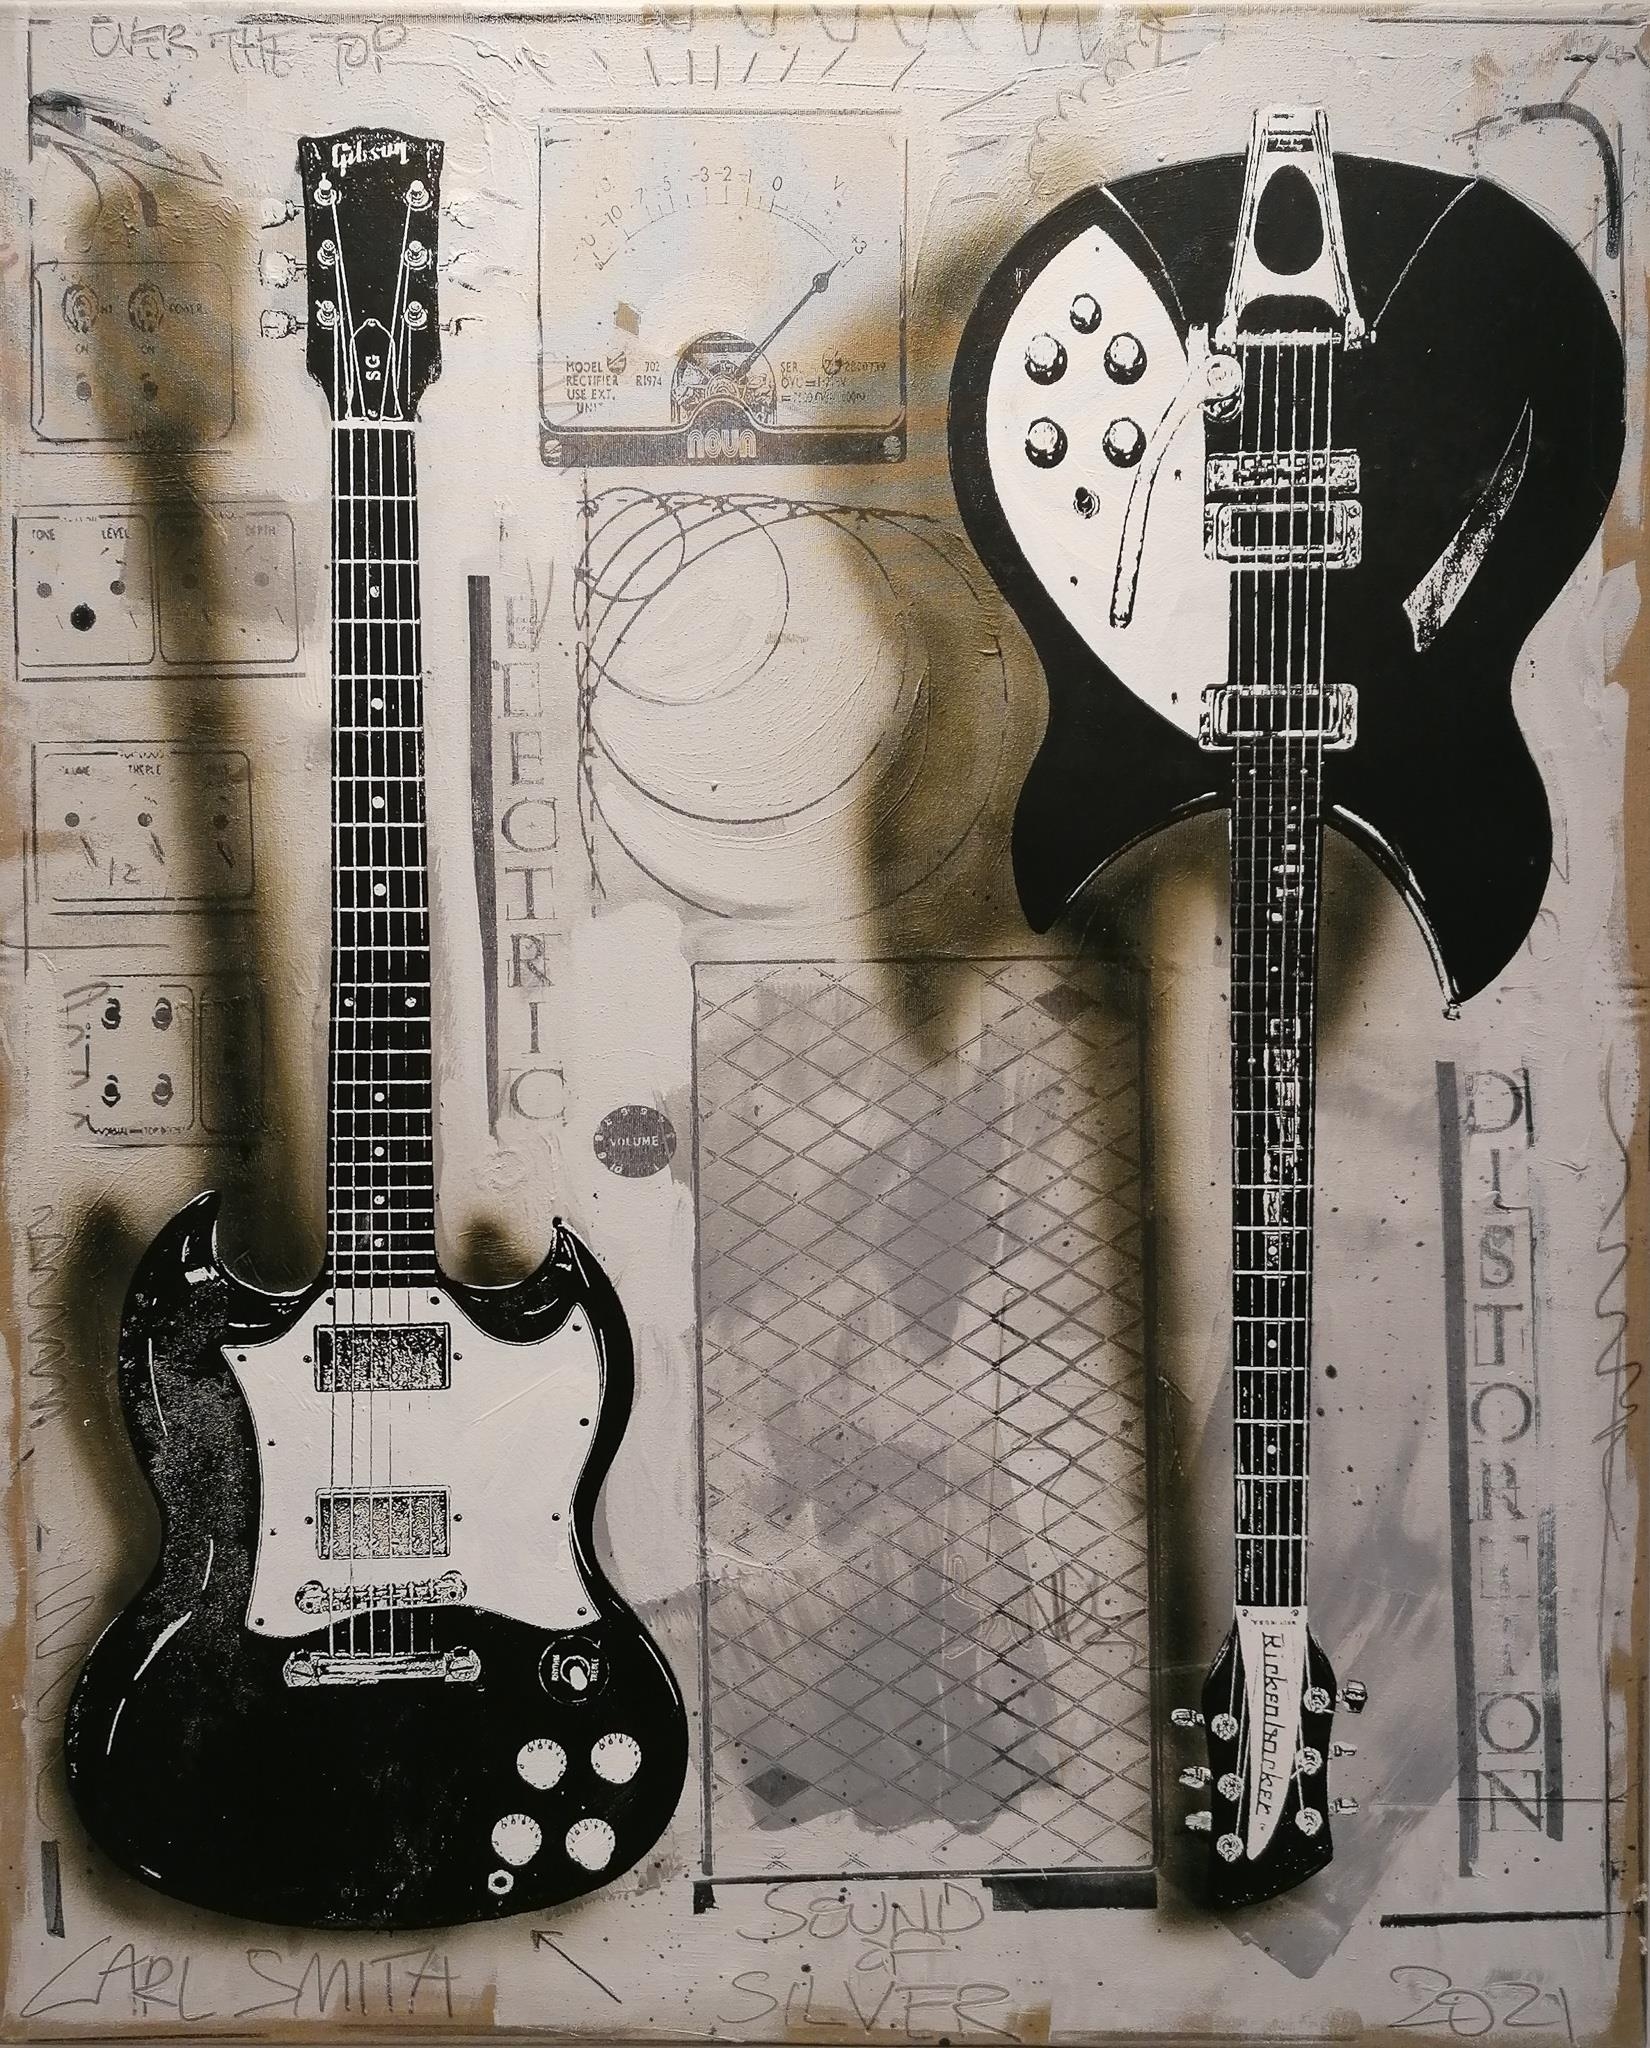 Sound of silver - Smith, Carl - k-2110CS6